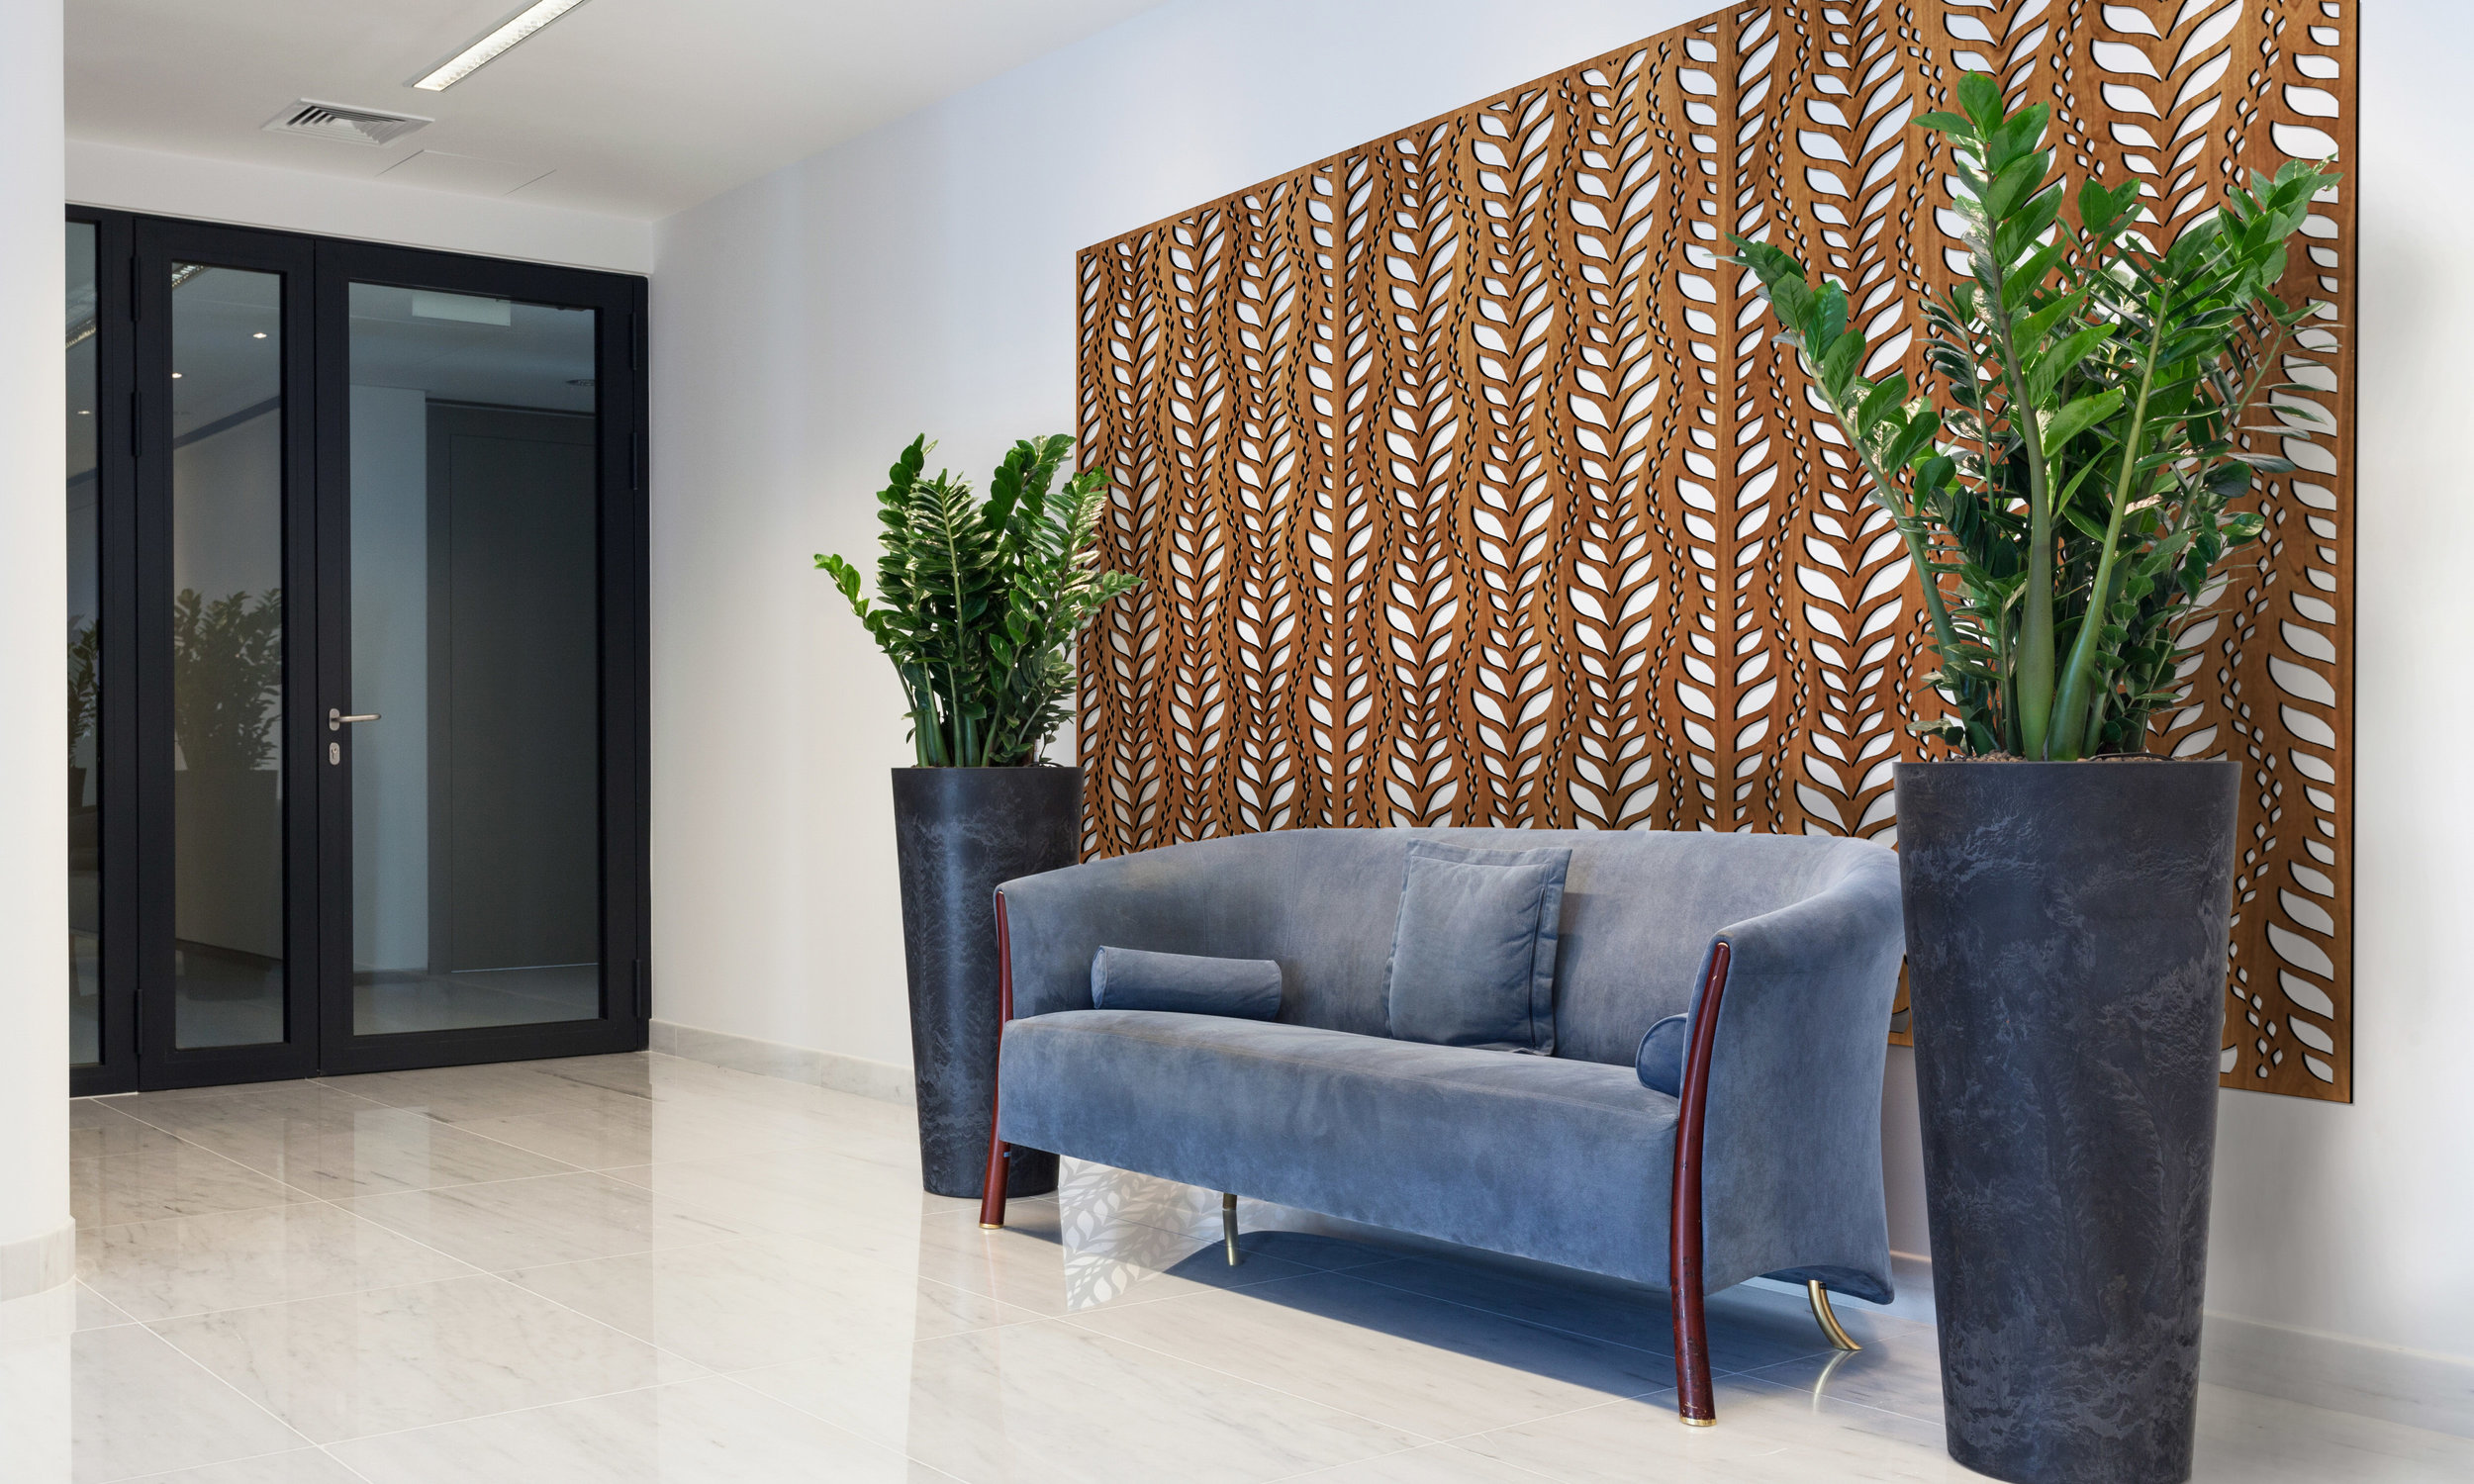 Installation Rendering A   La Jolla decorative office wall panel - shown in Cherry